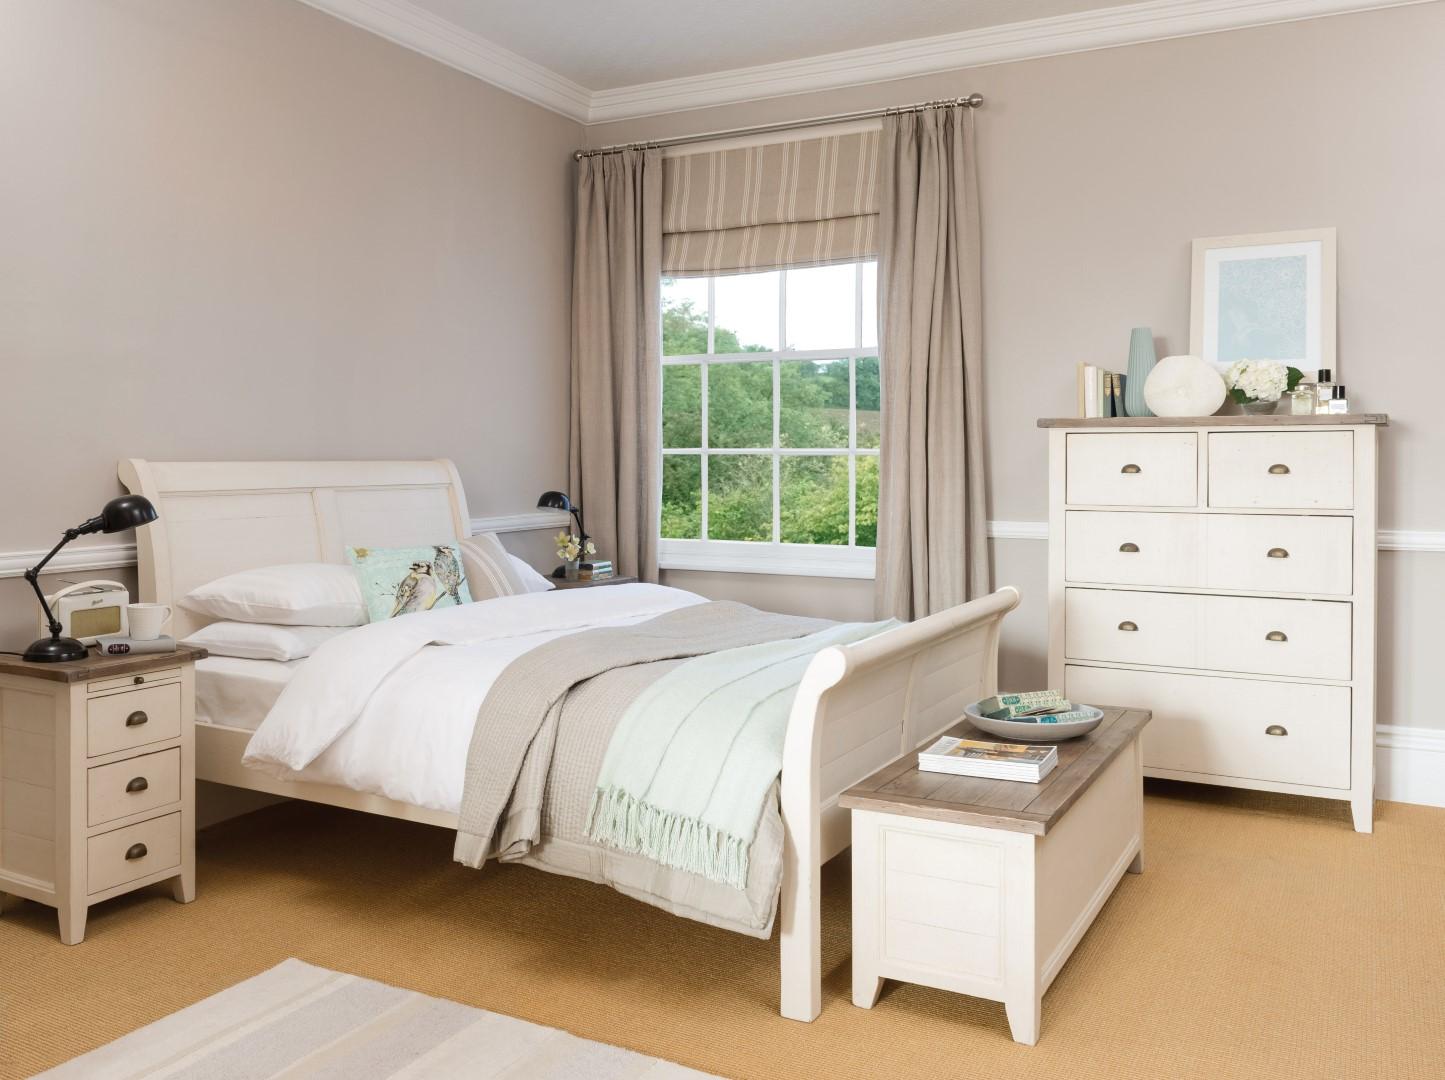 Cotswood Bedroom (1) (Large).jpg